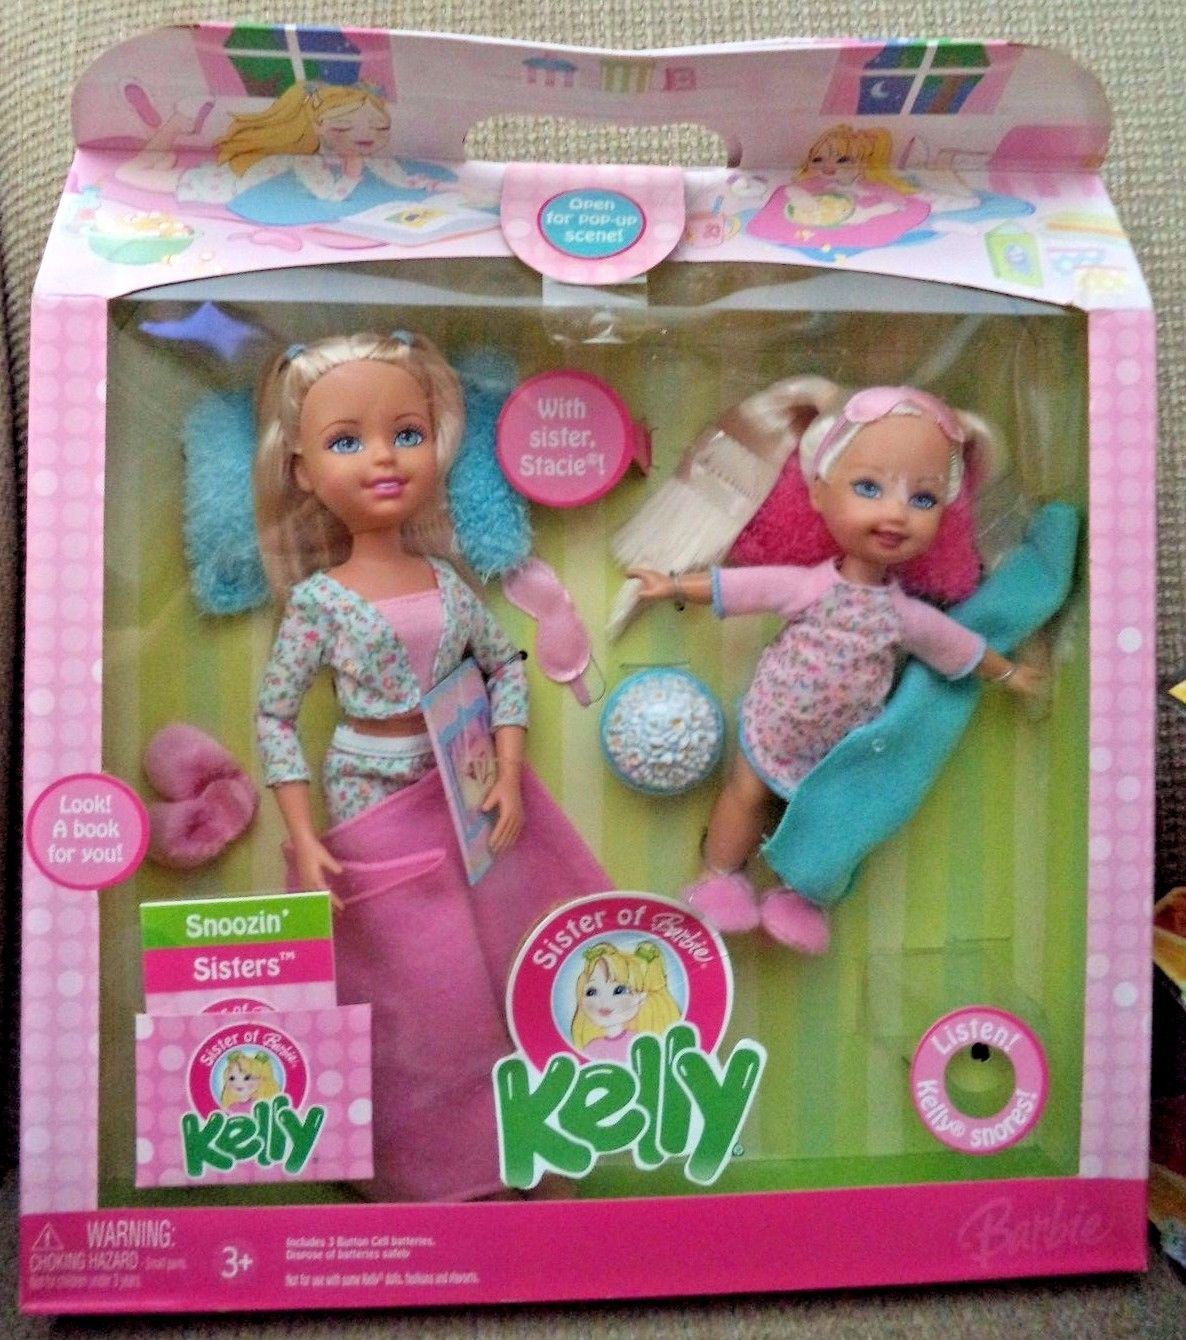 Pin By Luisa Narvaez On Wishlist Mattel Barbie Dolls I M A Barbie Girl Barbie Girl